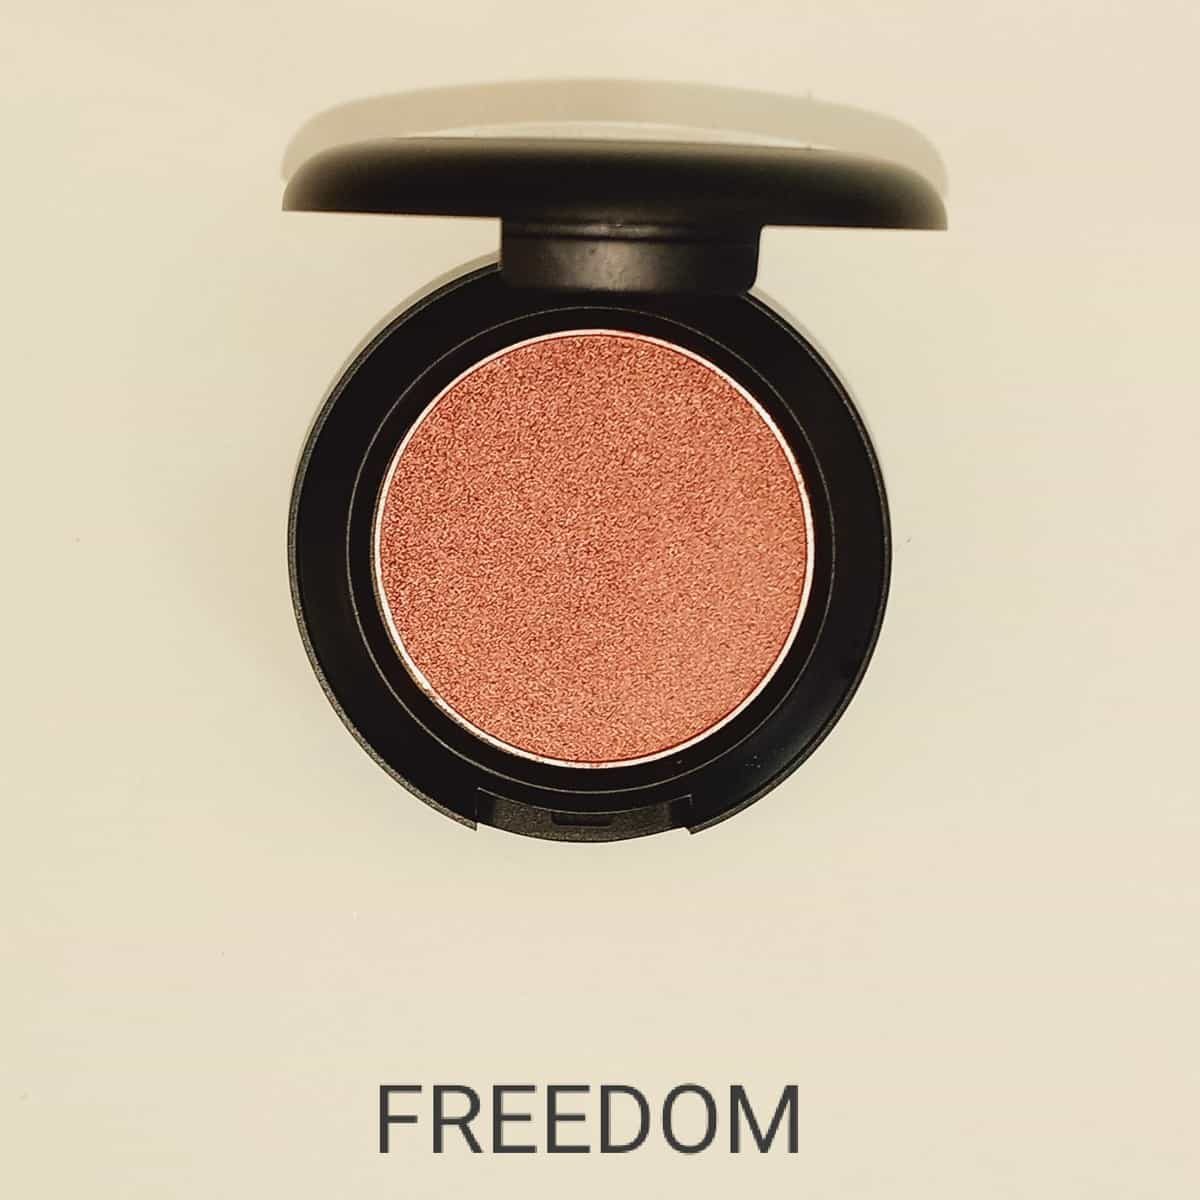 Freedom-min